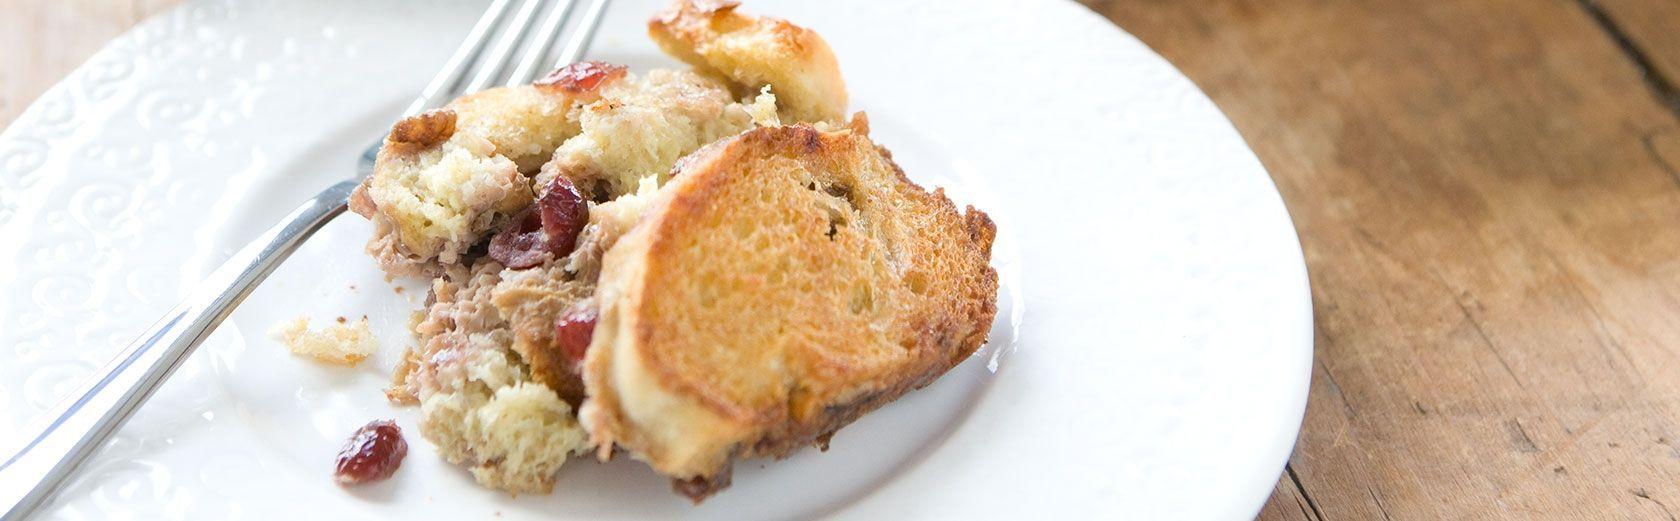 Whole Foods Market Recipes#foods #market #recipes #pumpkinseedsrecipebaked